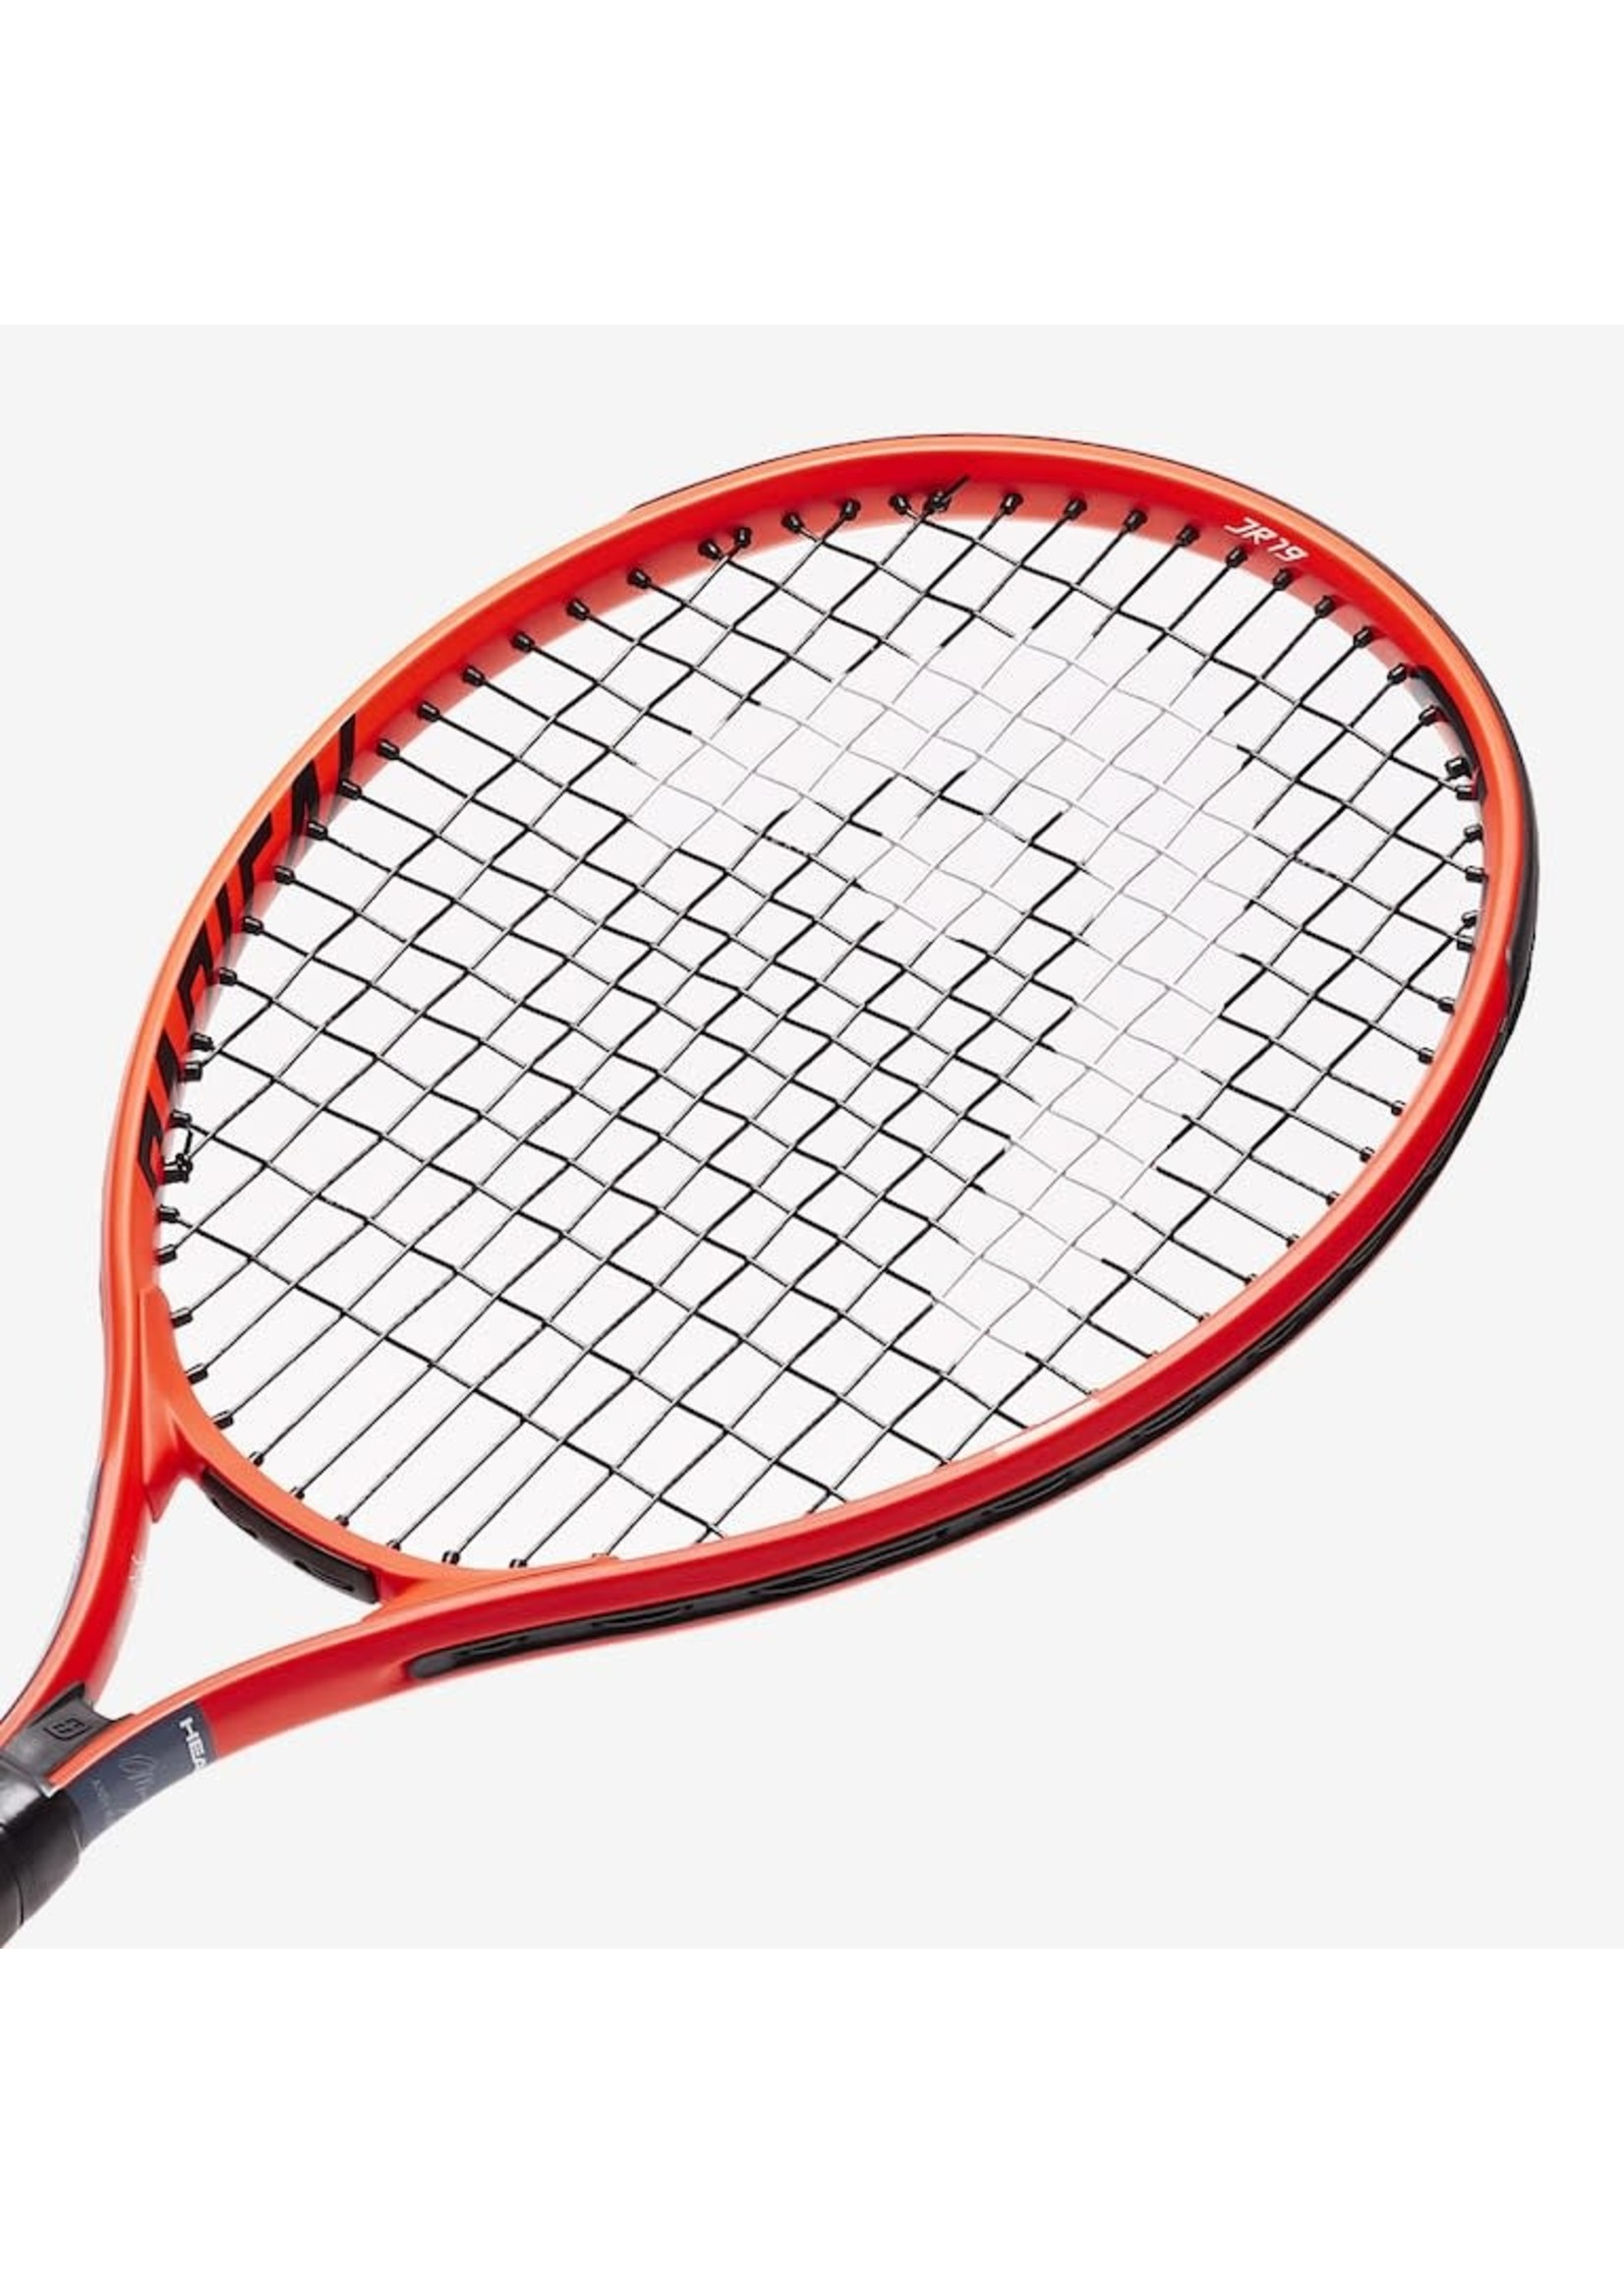 Head Head Radical Junior Tennis Racket (2019)